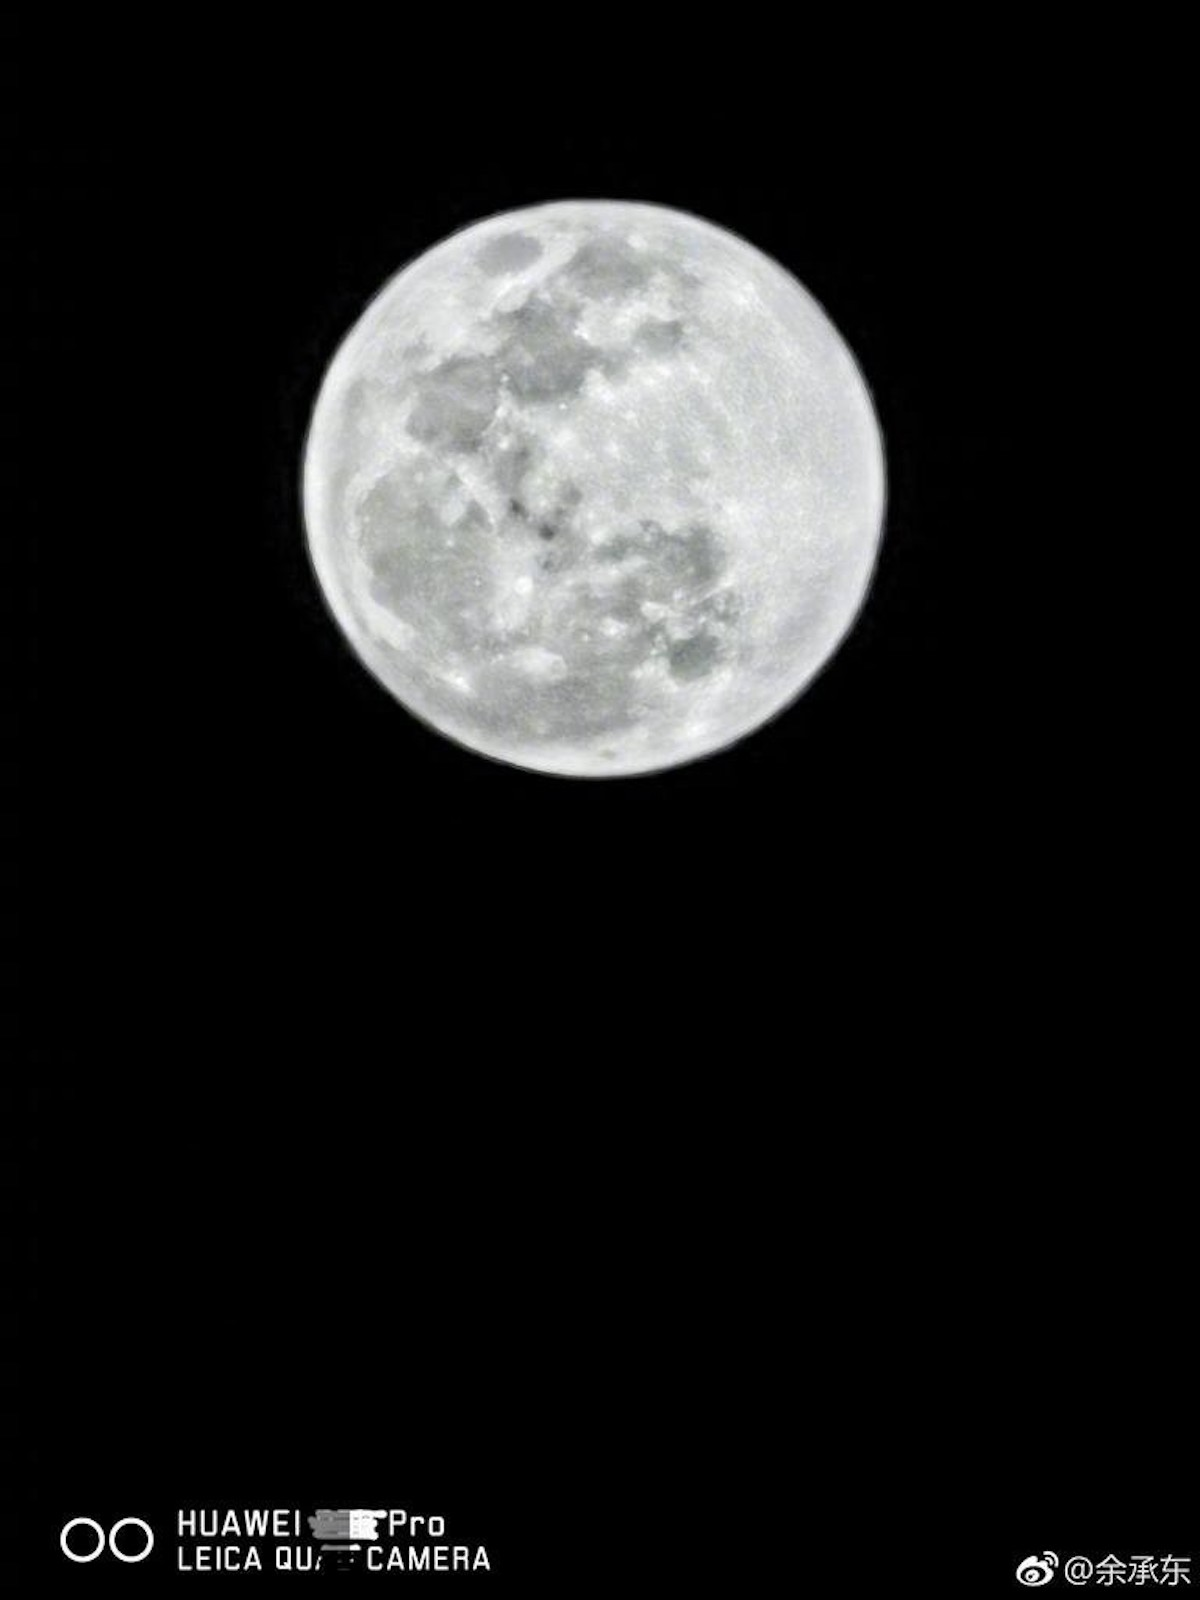 fotografia huawei p30 pro zoom 10x